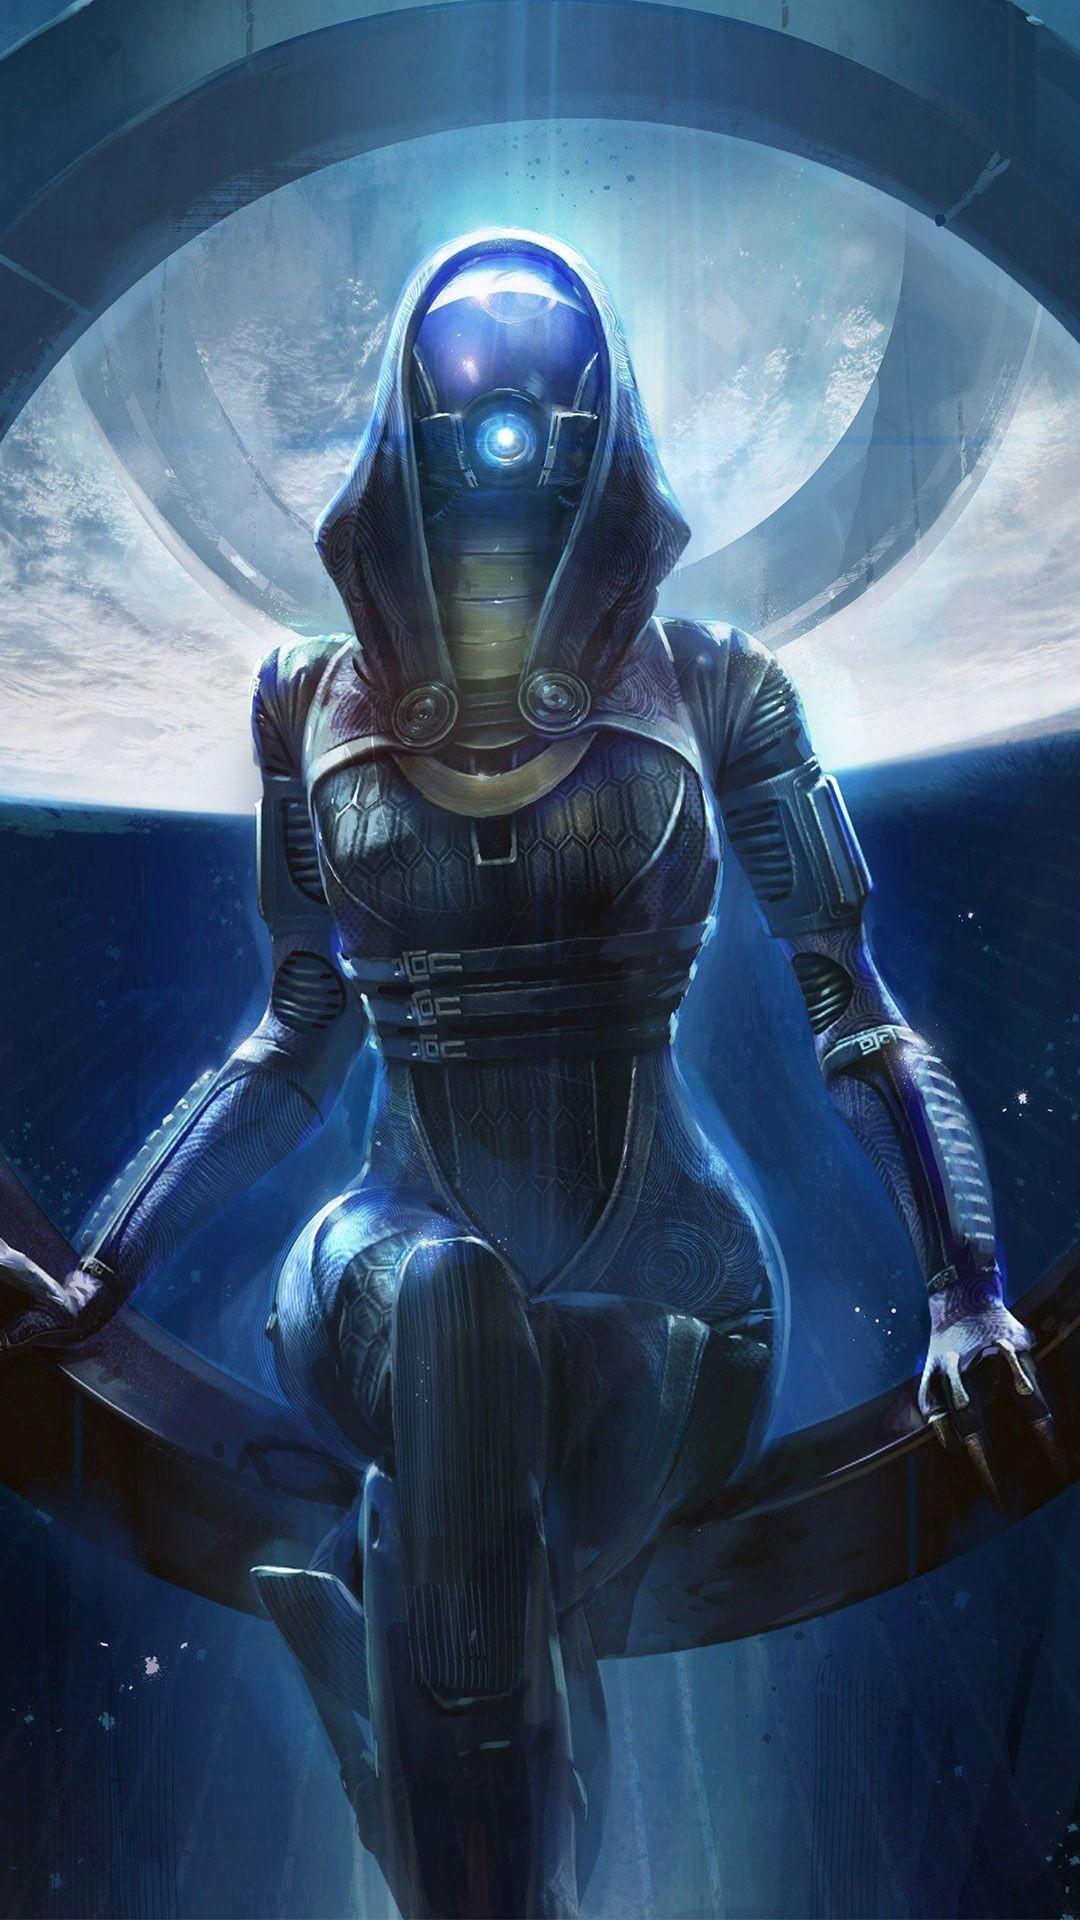 Tali'Zorah – Mass Effect